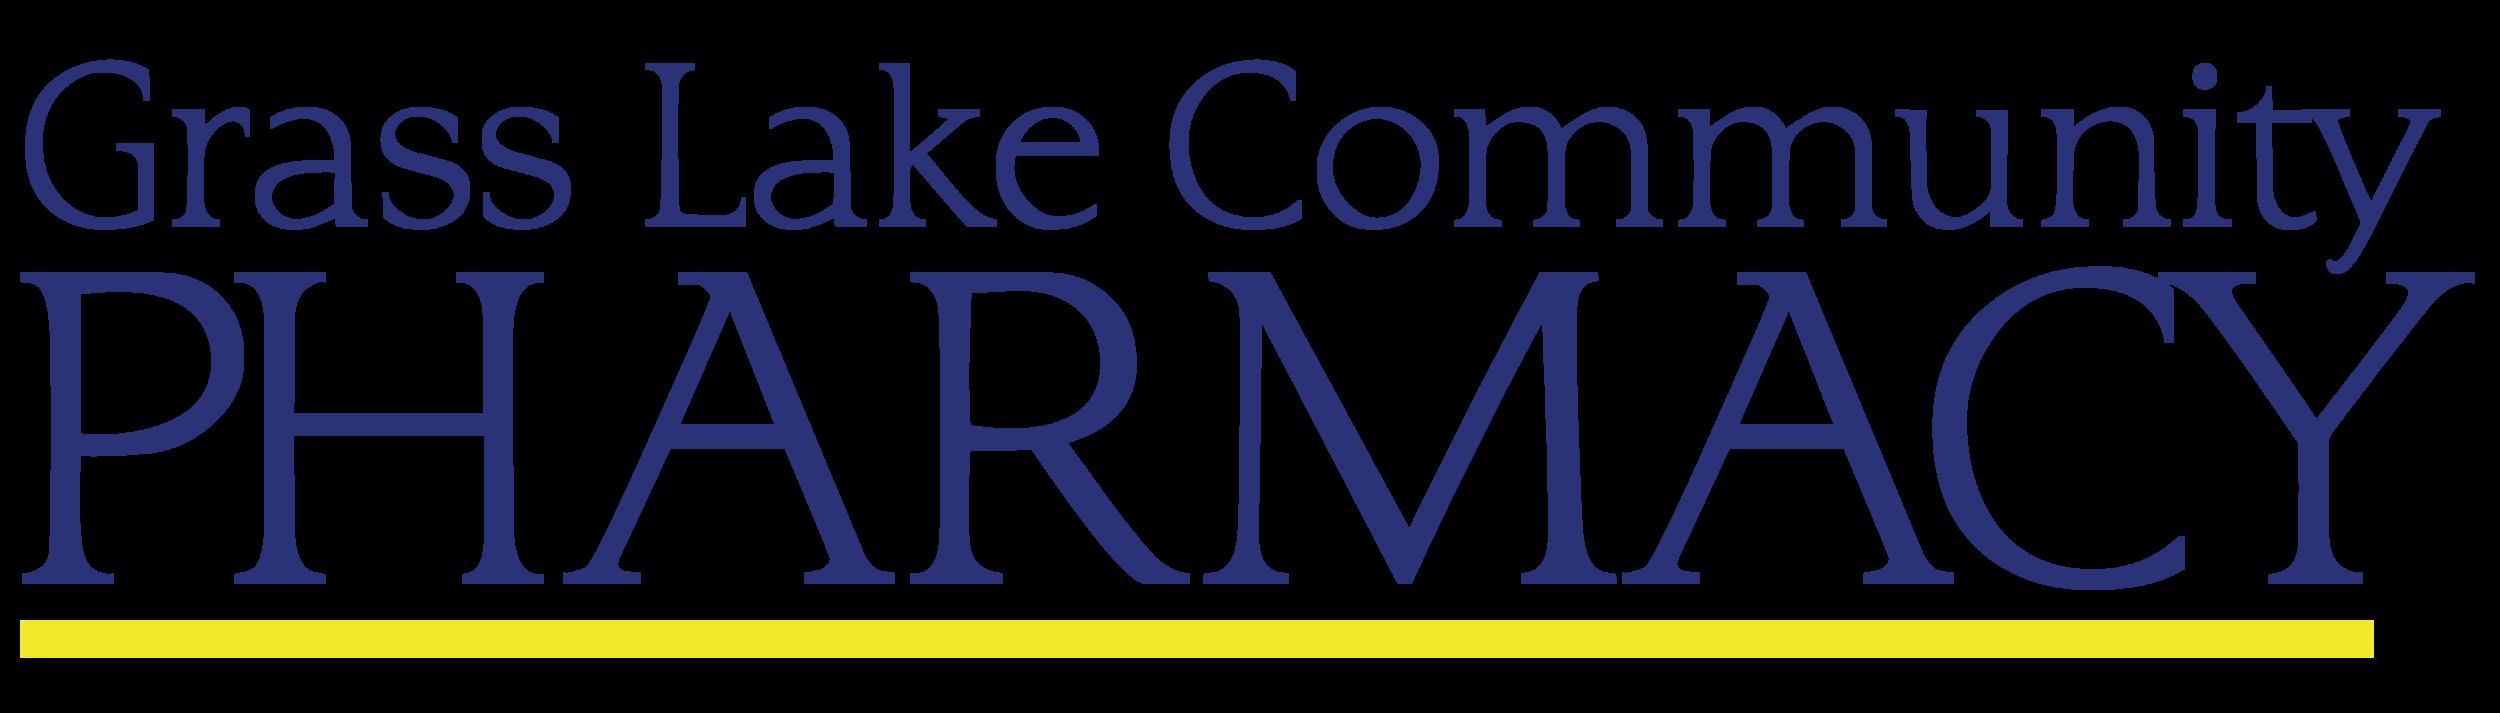 grass lake community pharmacy logo